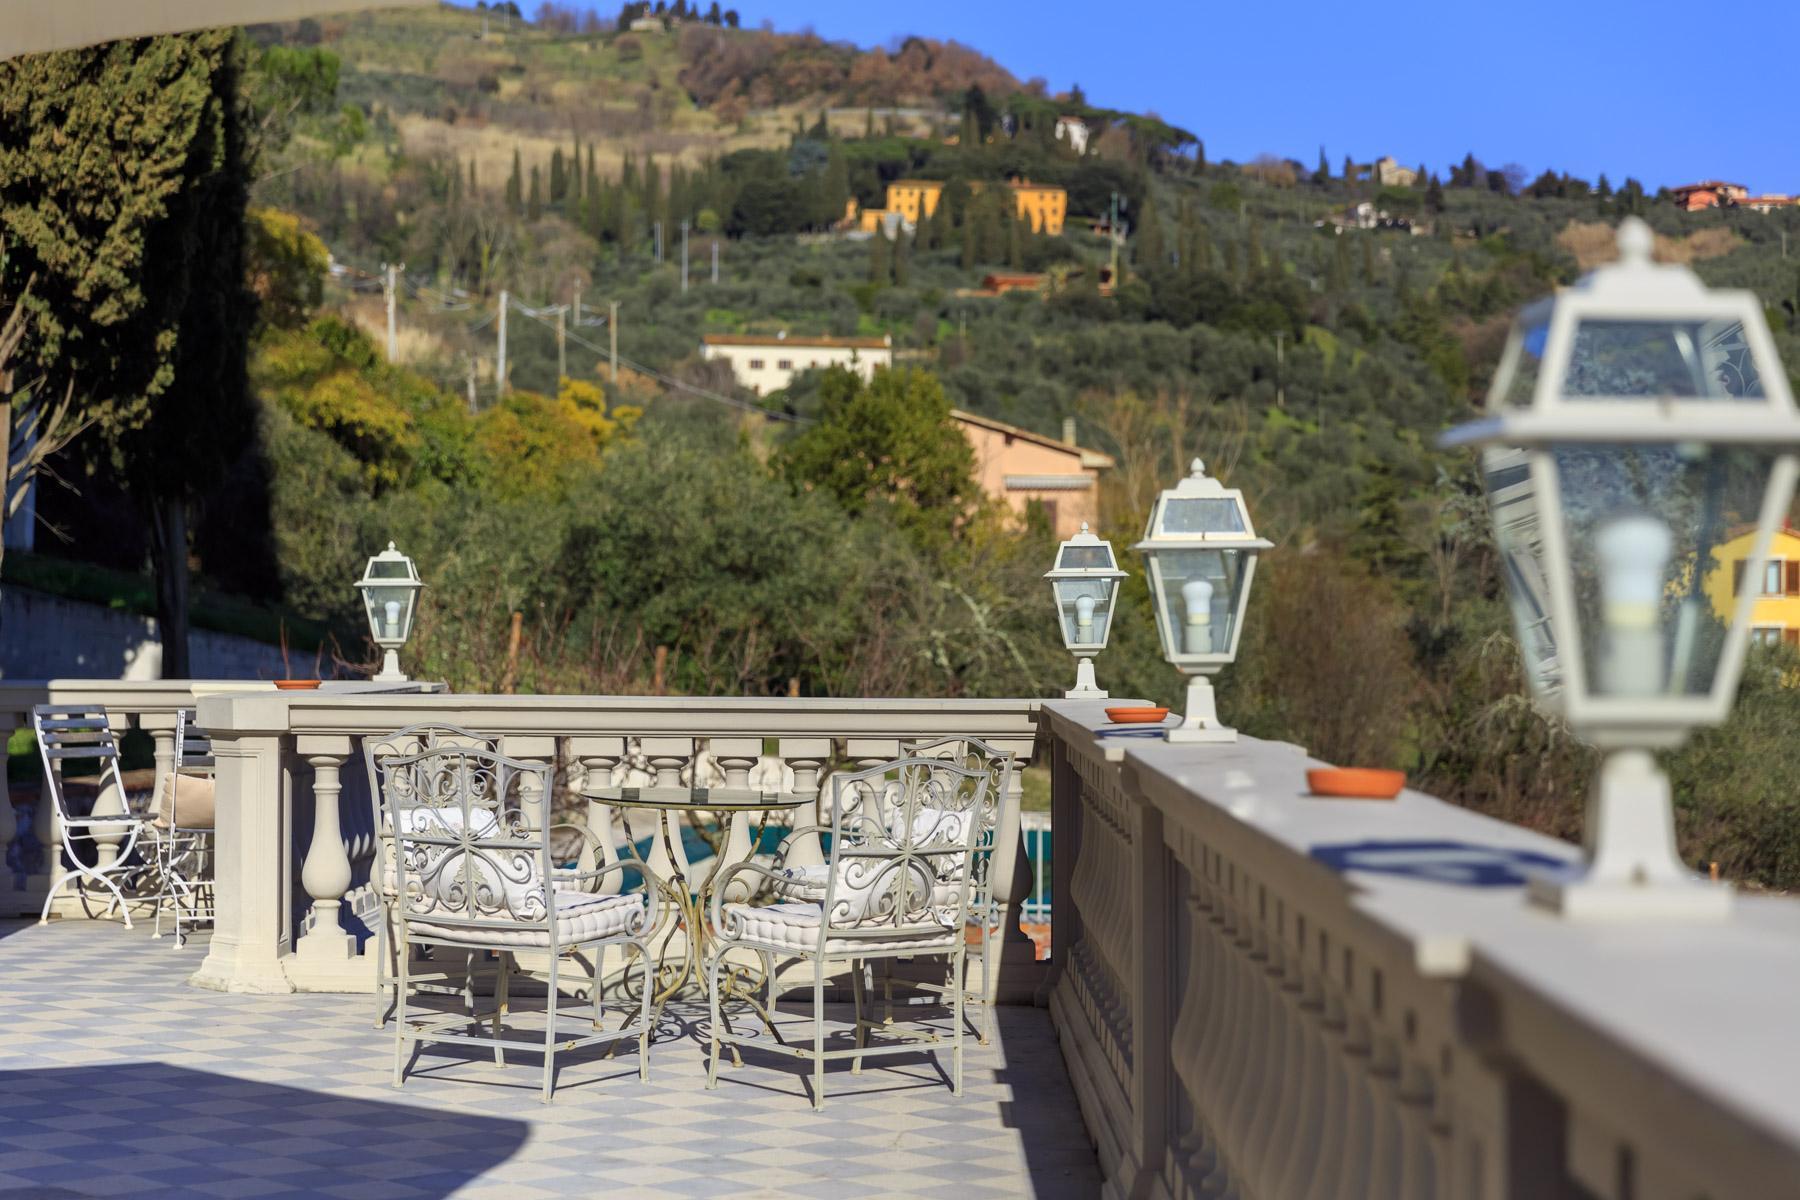 Montecatini Terme小镇优雅的新艺术风格的别墅 - 30